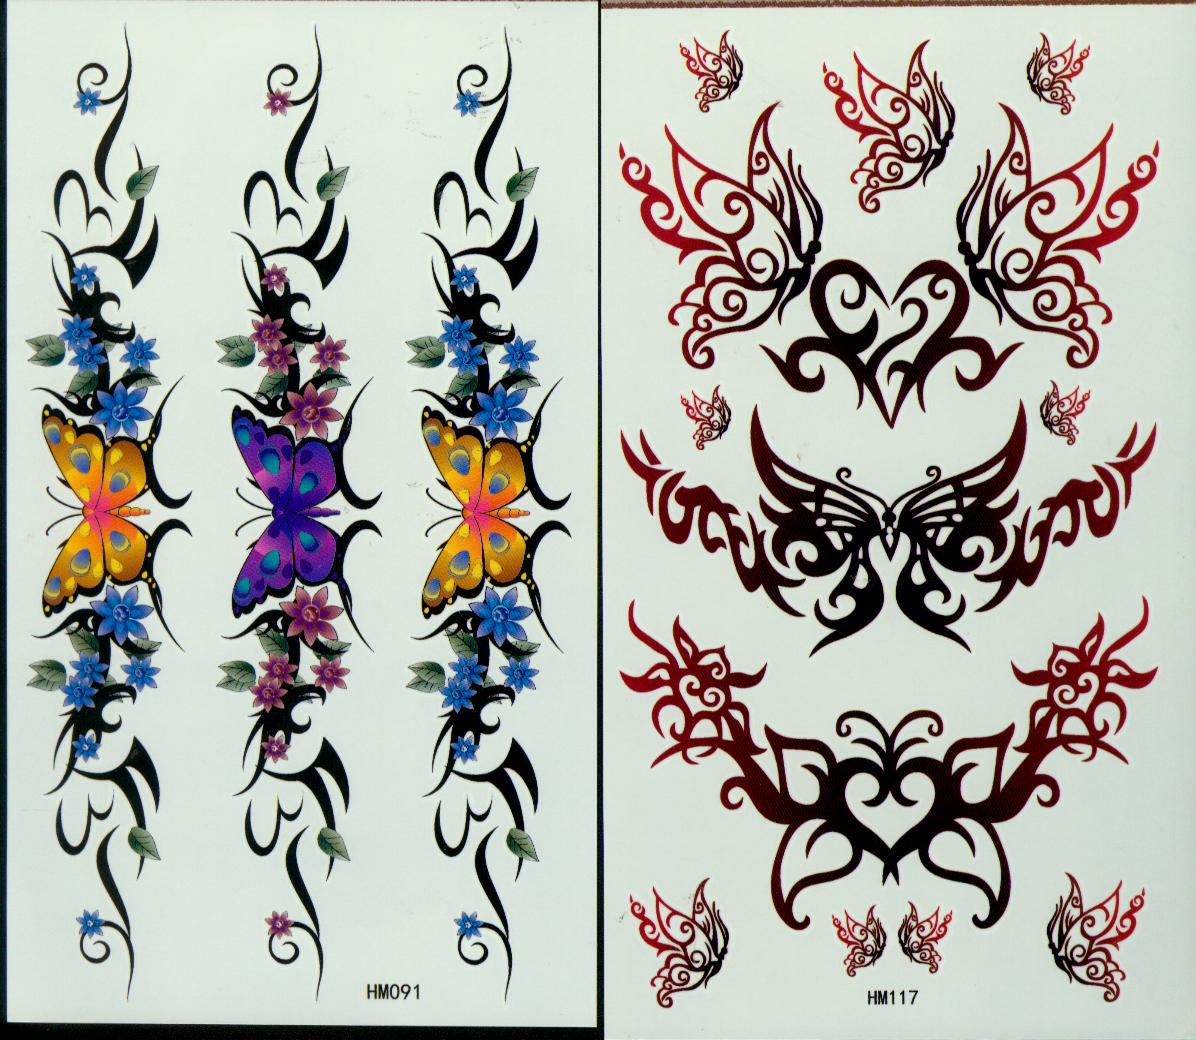 Temporary Tattoos Tattoo For Body Art Spiders Tattoo Waterproof Arm Chest Tattoos Stickers